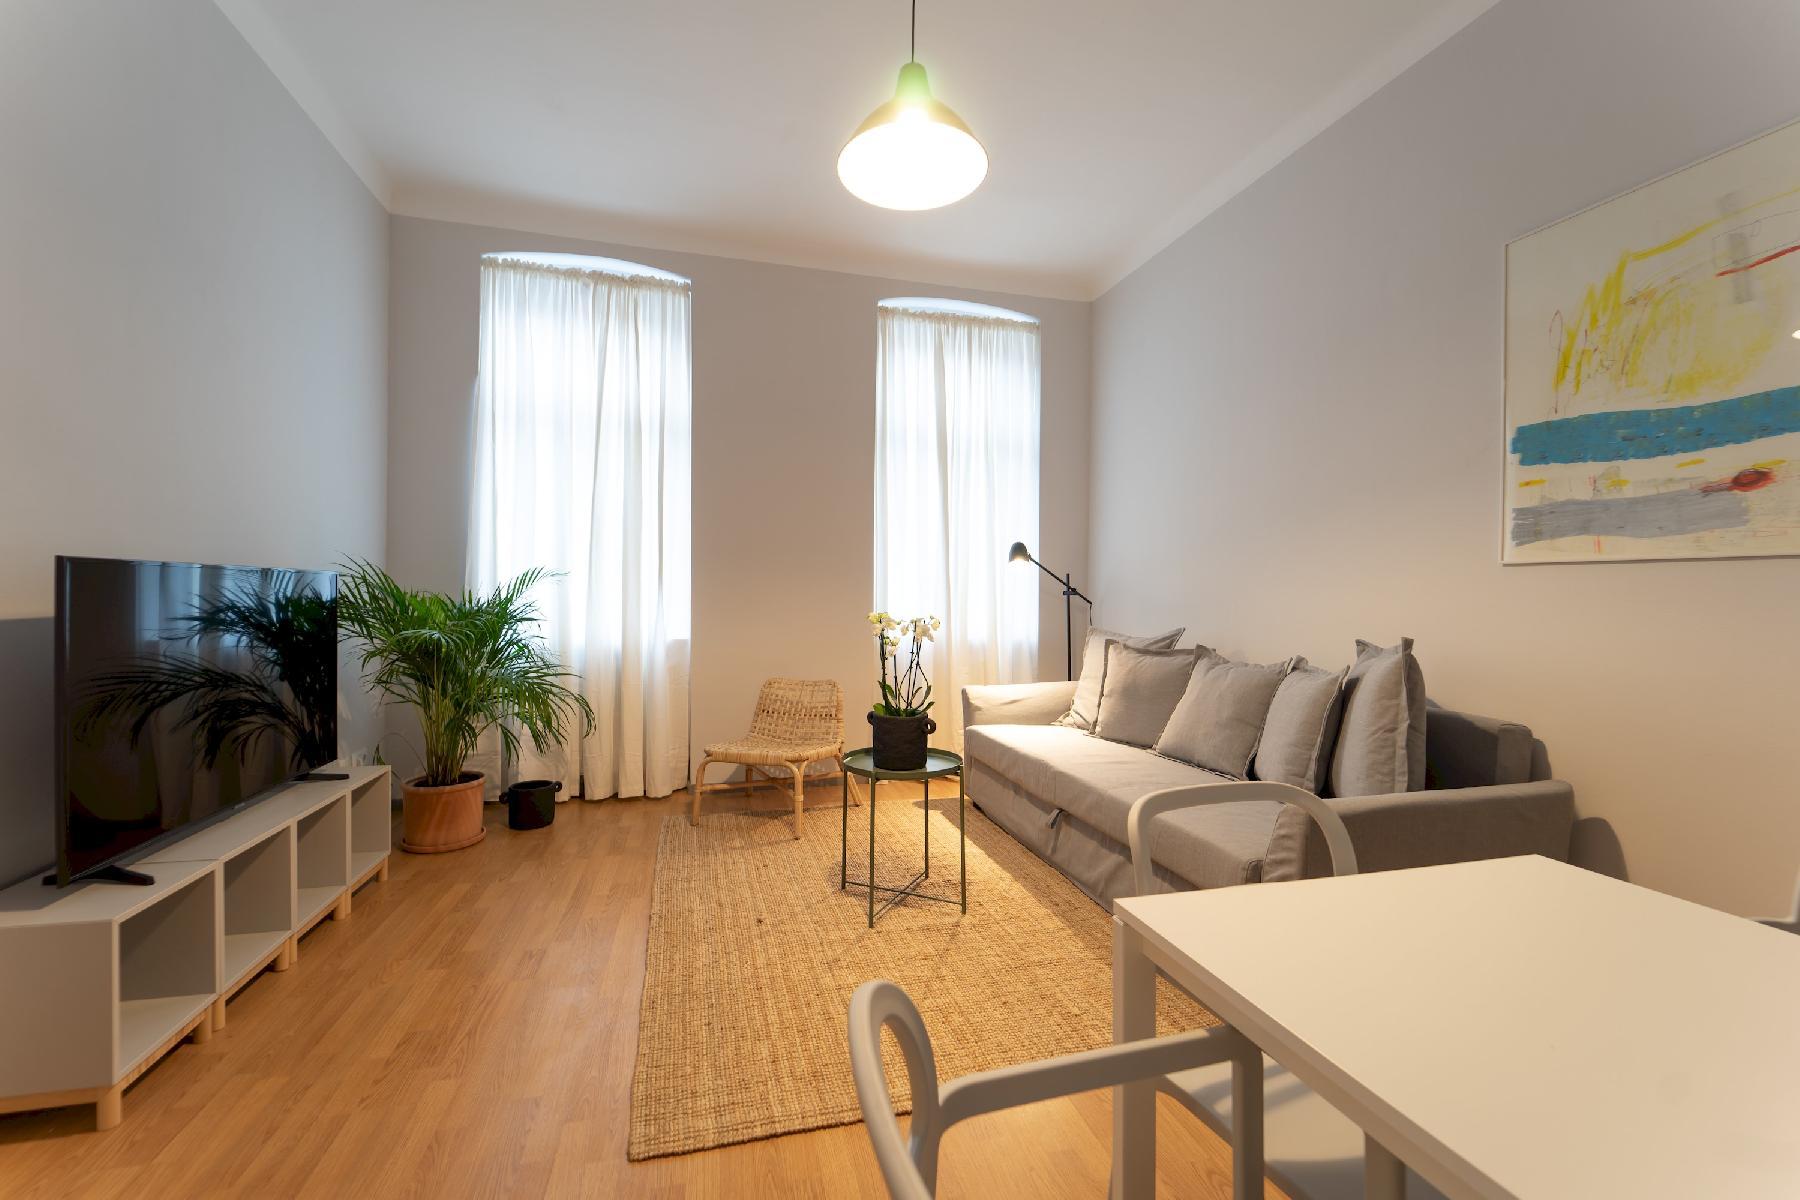 Cozy and quiet Apartment in Beautiful Neighborhood